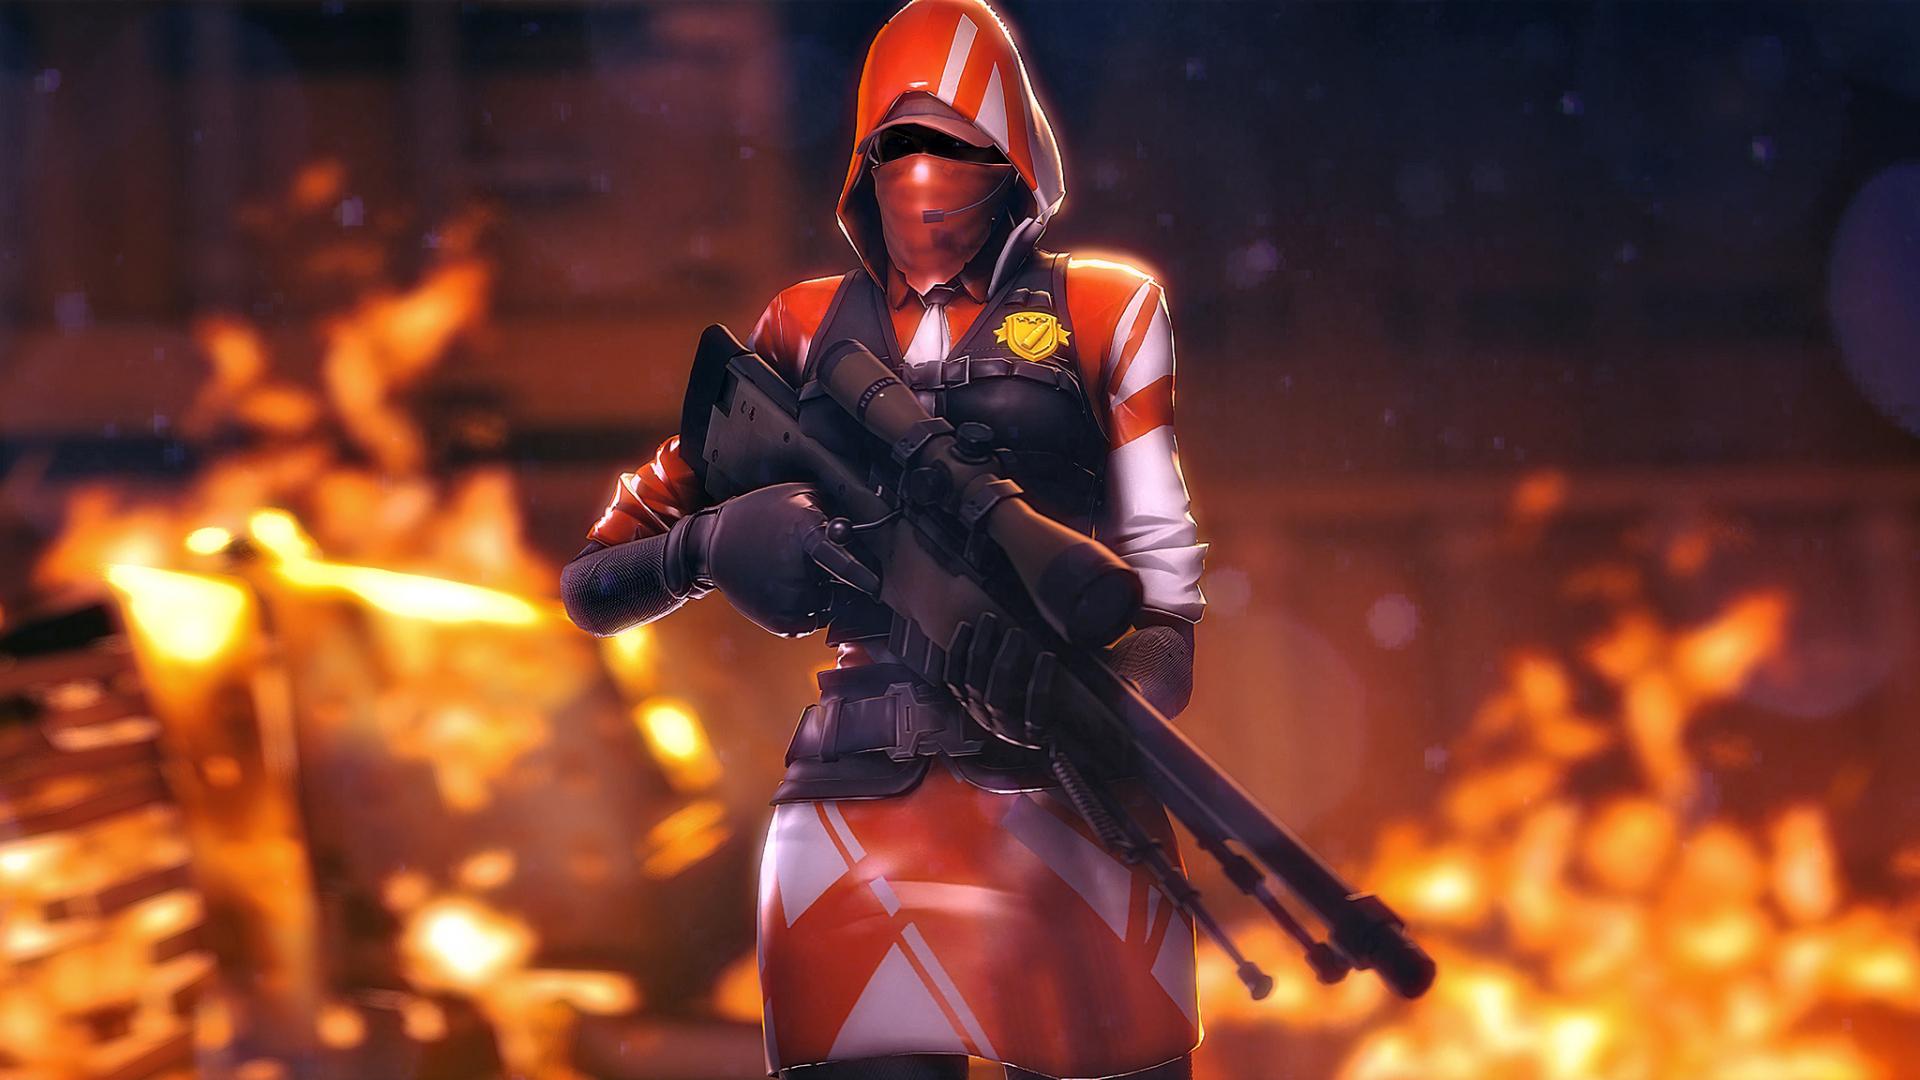 Free Download 2048x1152 Ace Sniper Rifle Fortnite Battle